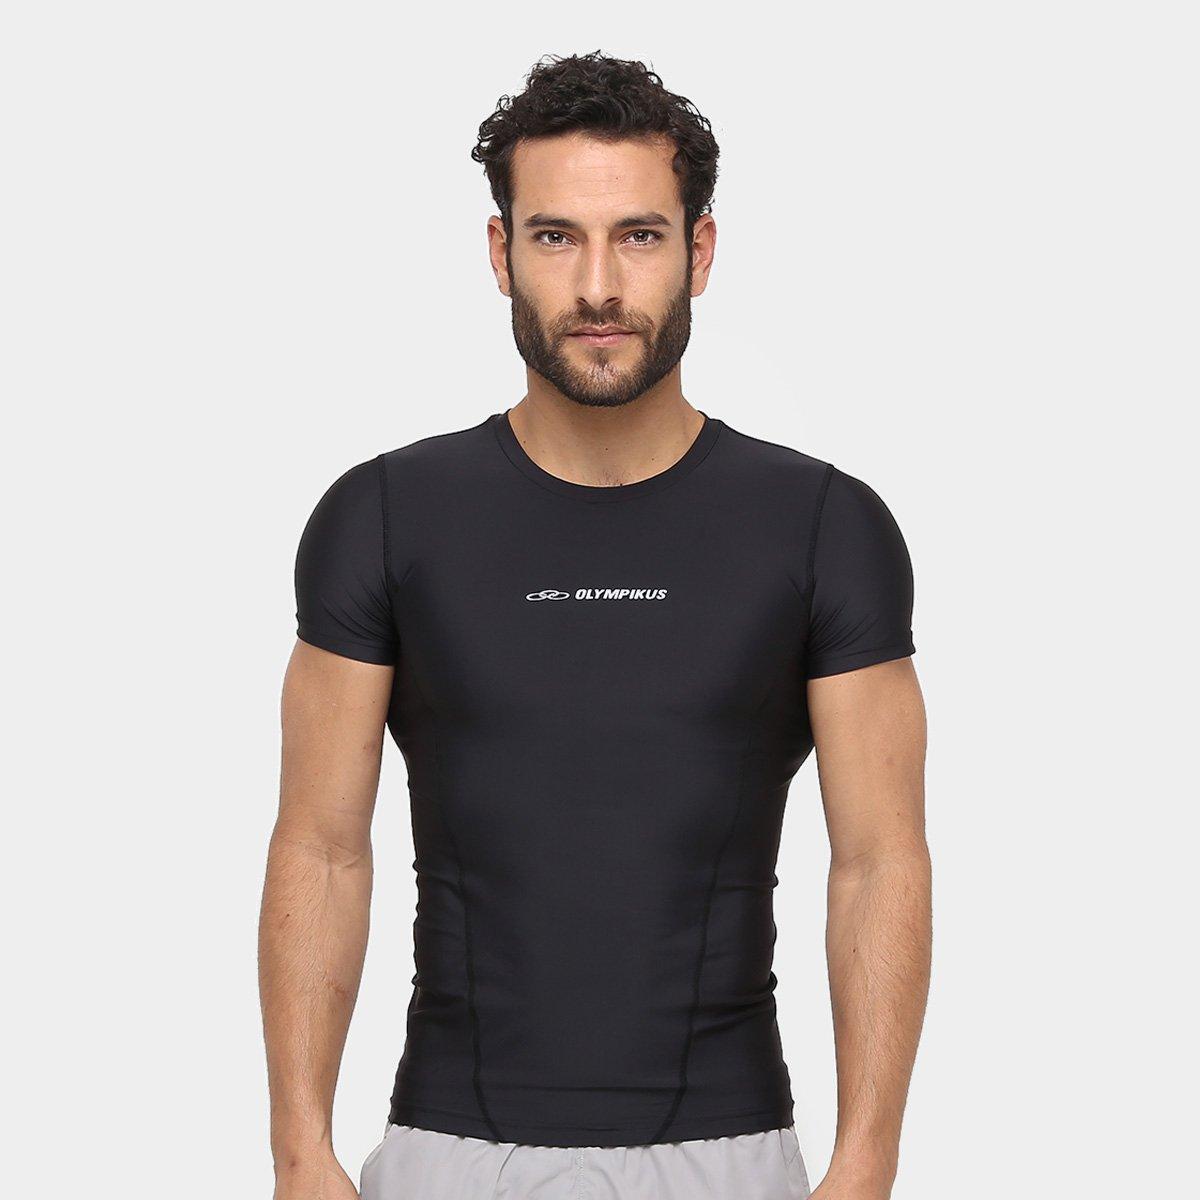 Camiseta Olympikus Compressão Masculina - Compre Agora  c8dd39db18a71